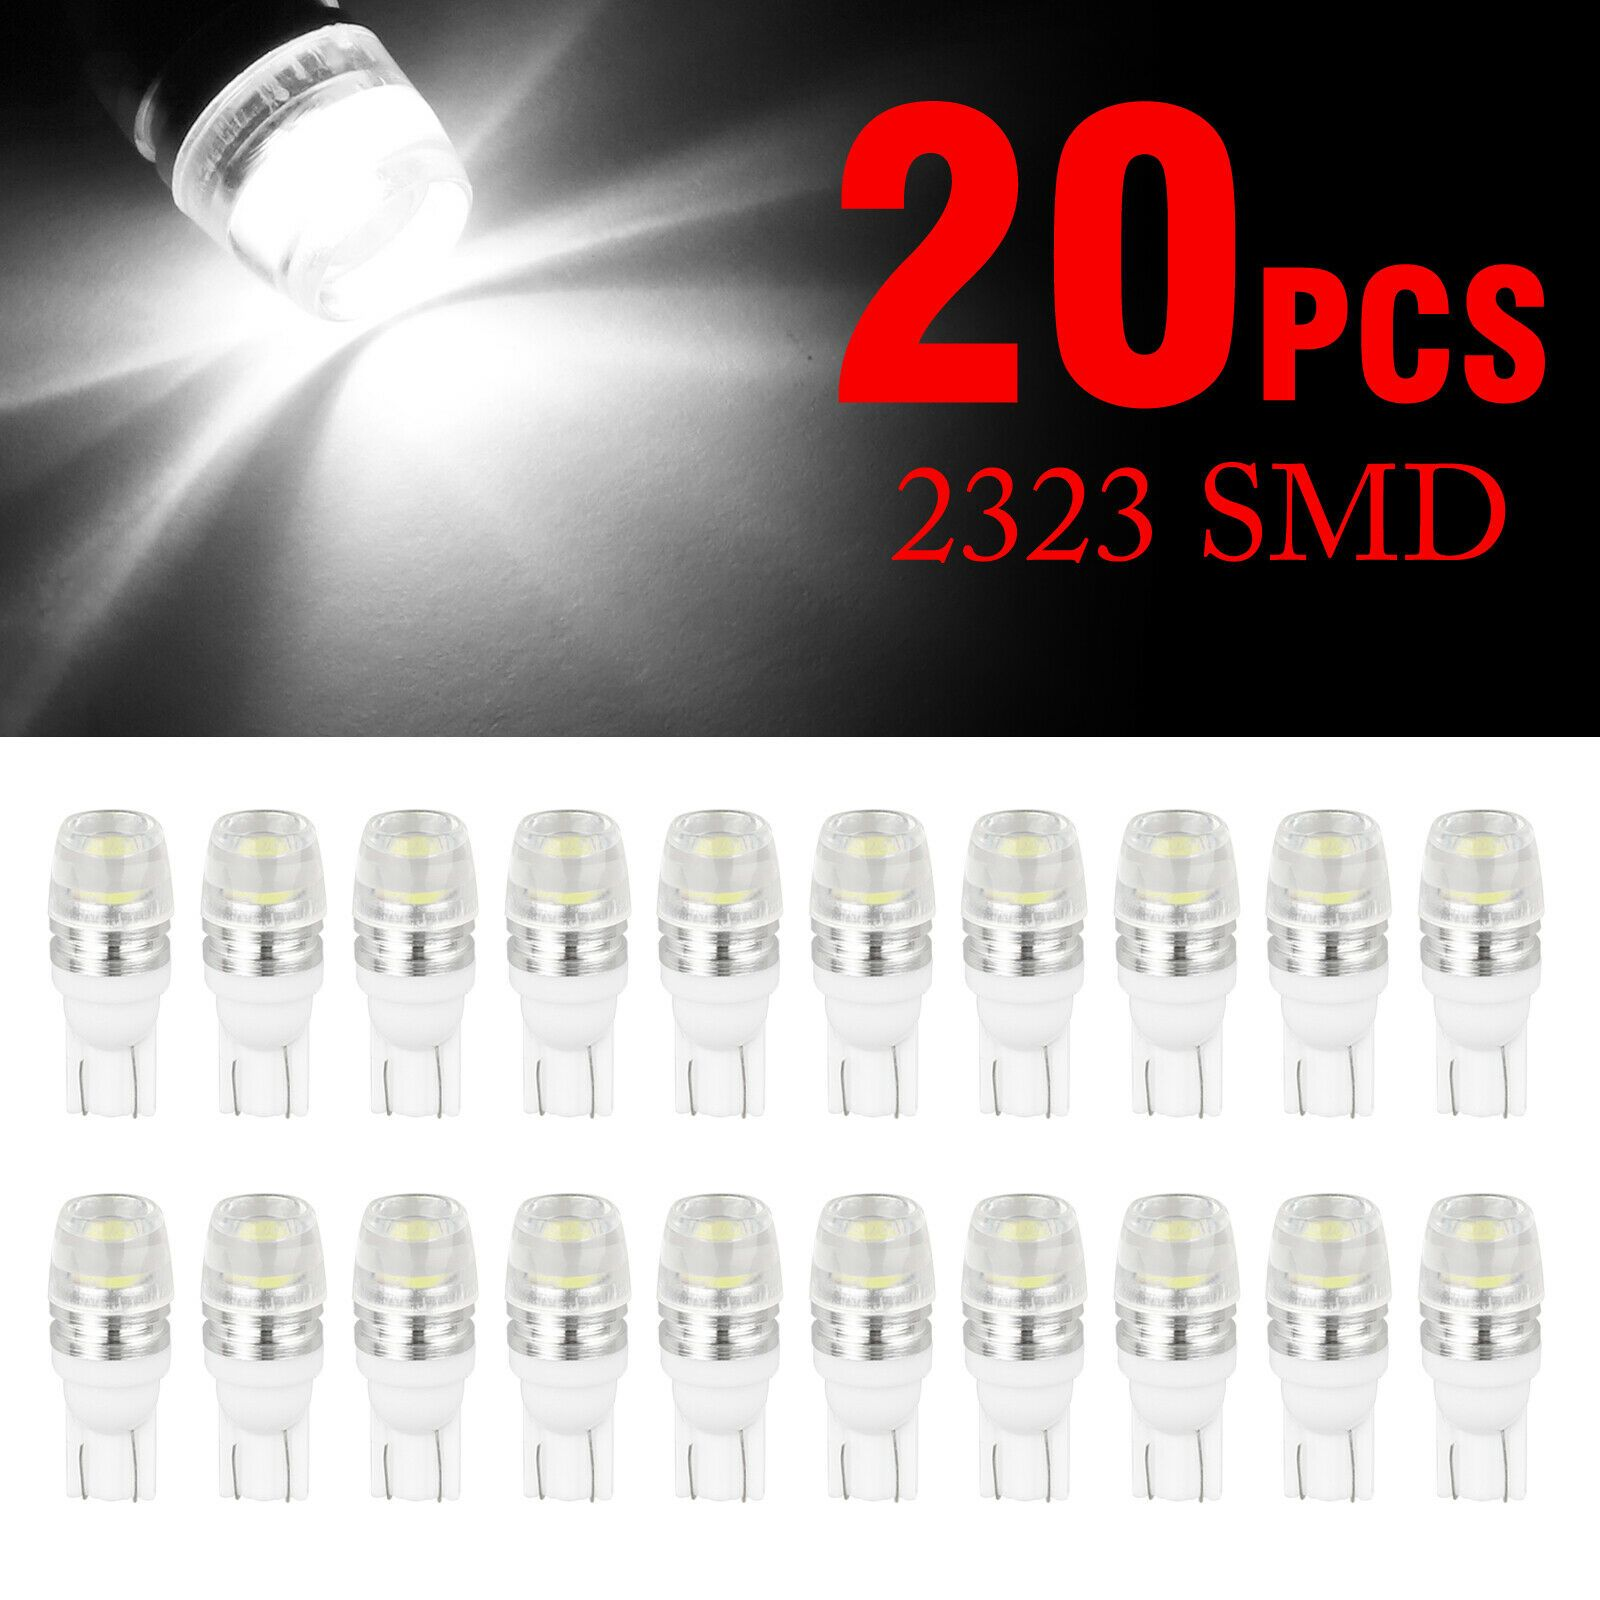 10x Blue T10 168 194 Led Bulbs Instrument Gauge Cluster Dash Light W Sockets In 2020 Light Bulb Lamp Led Bulb Bulb